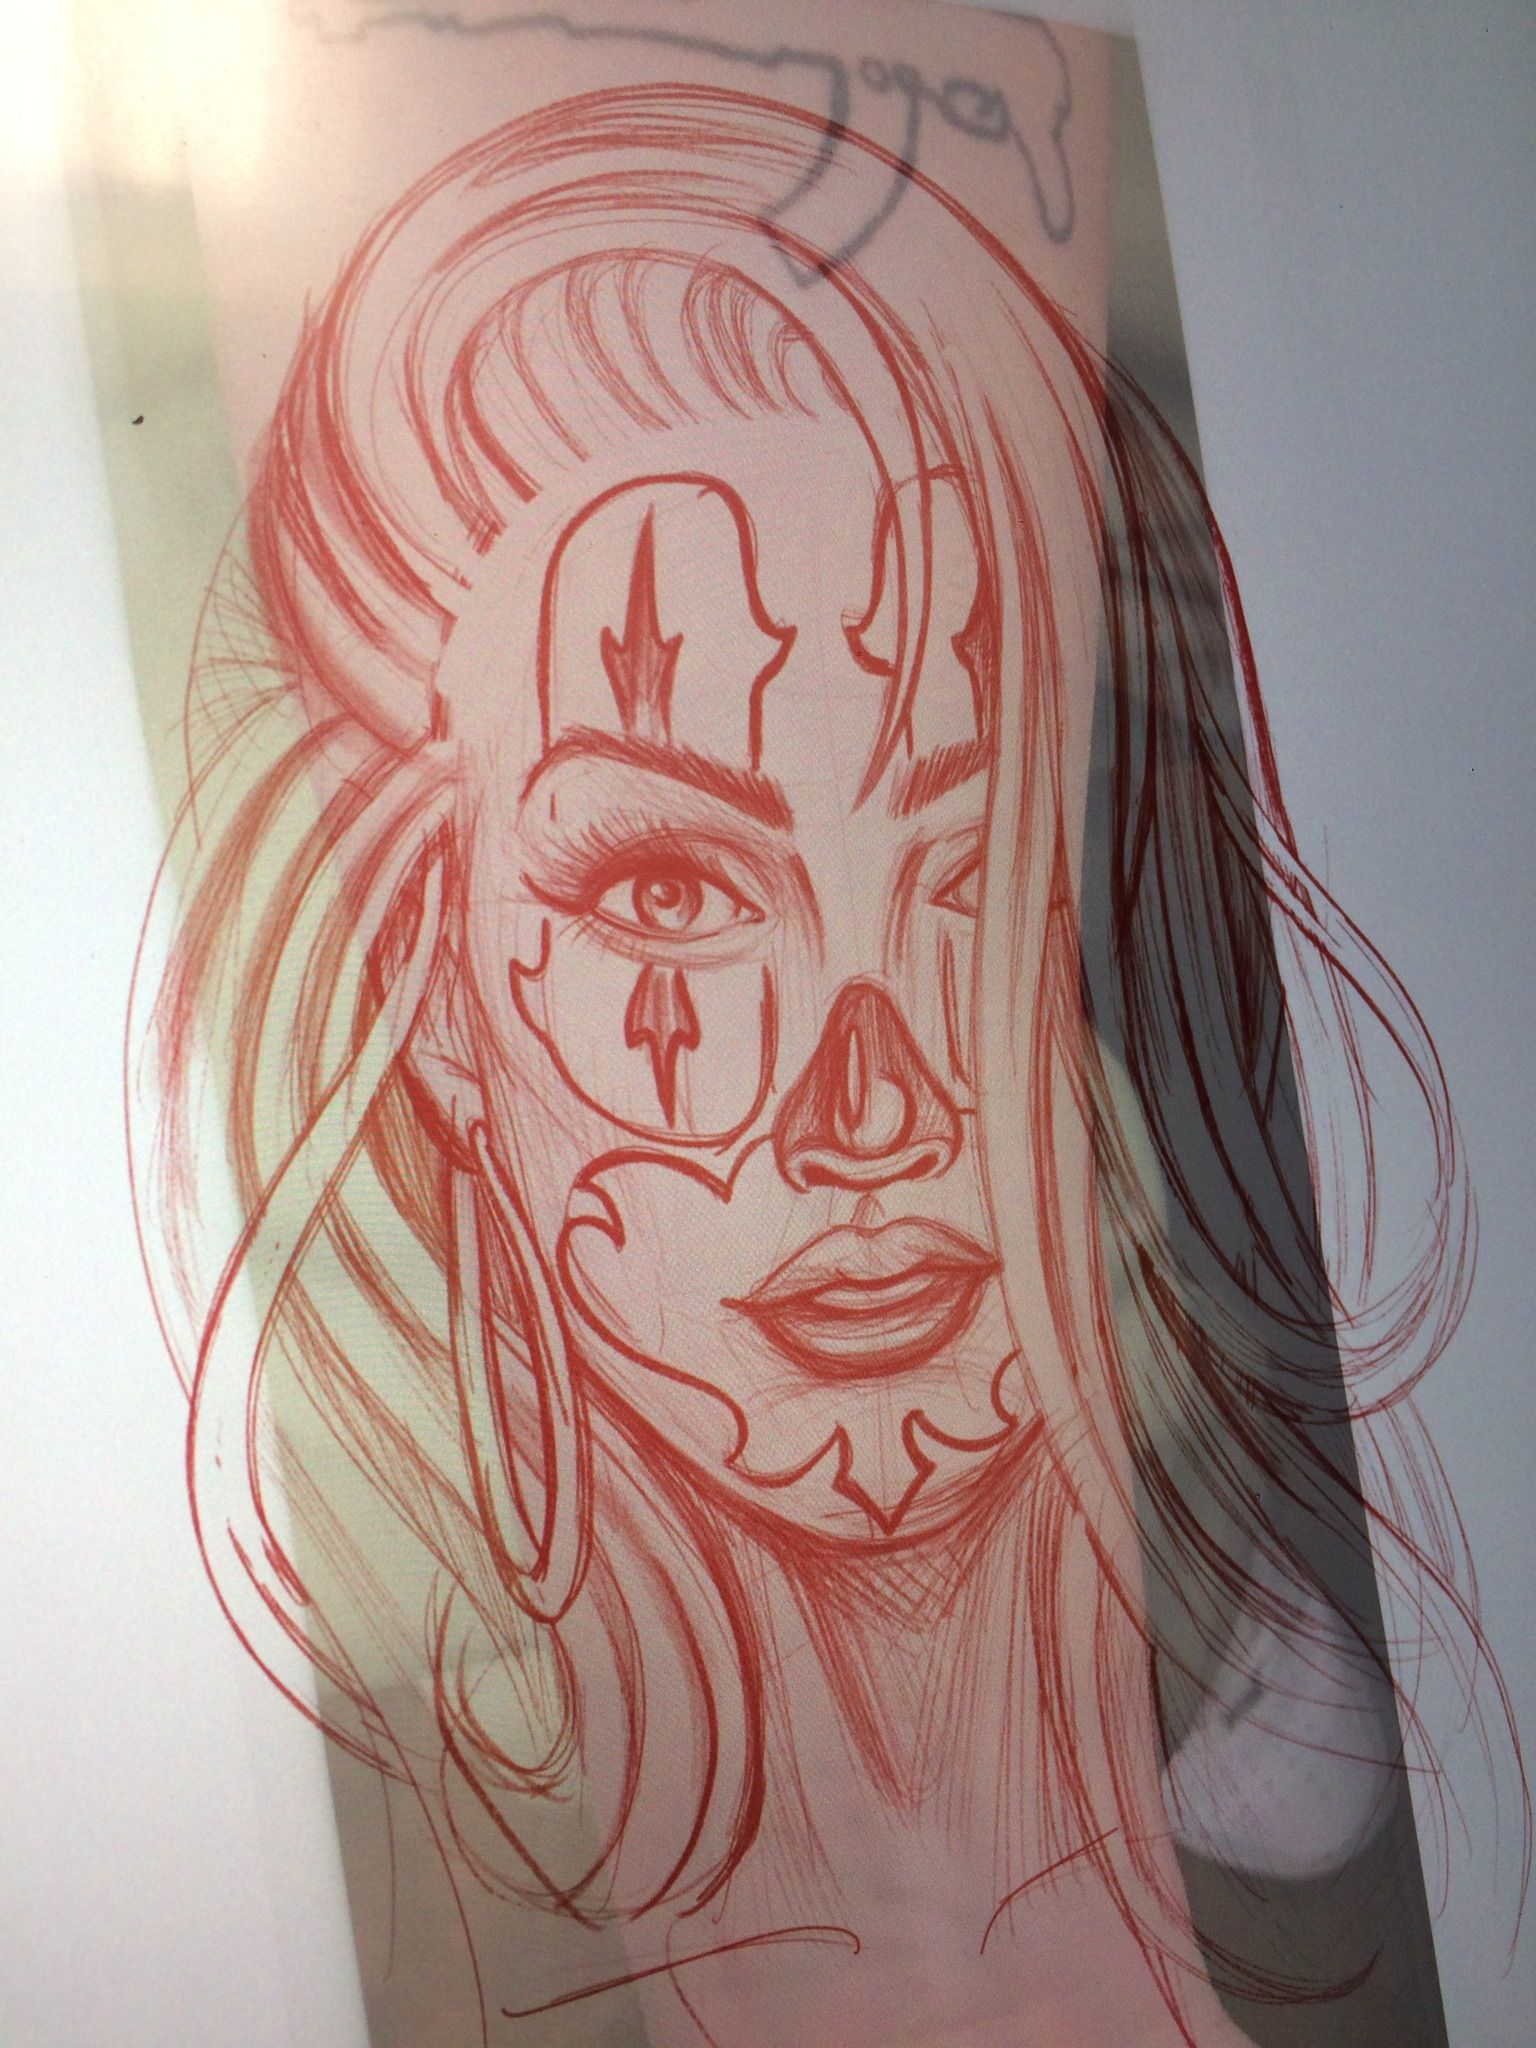 ae7185ed5 Malandro Chicano Tattoos, Chicano Art, Leg Tattoos, Girls With Sleeve  Tattoos, Tattoos